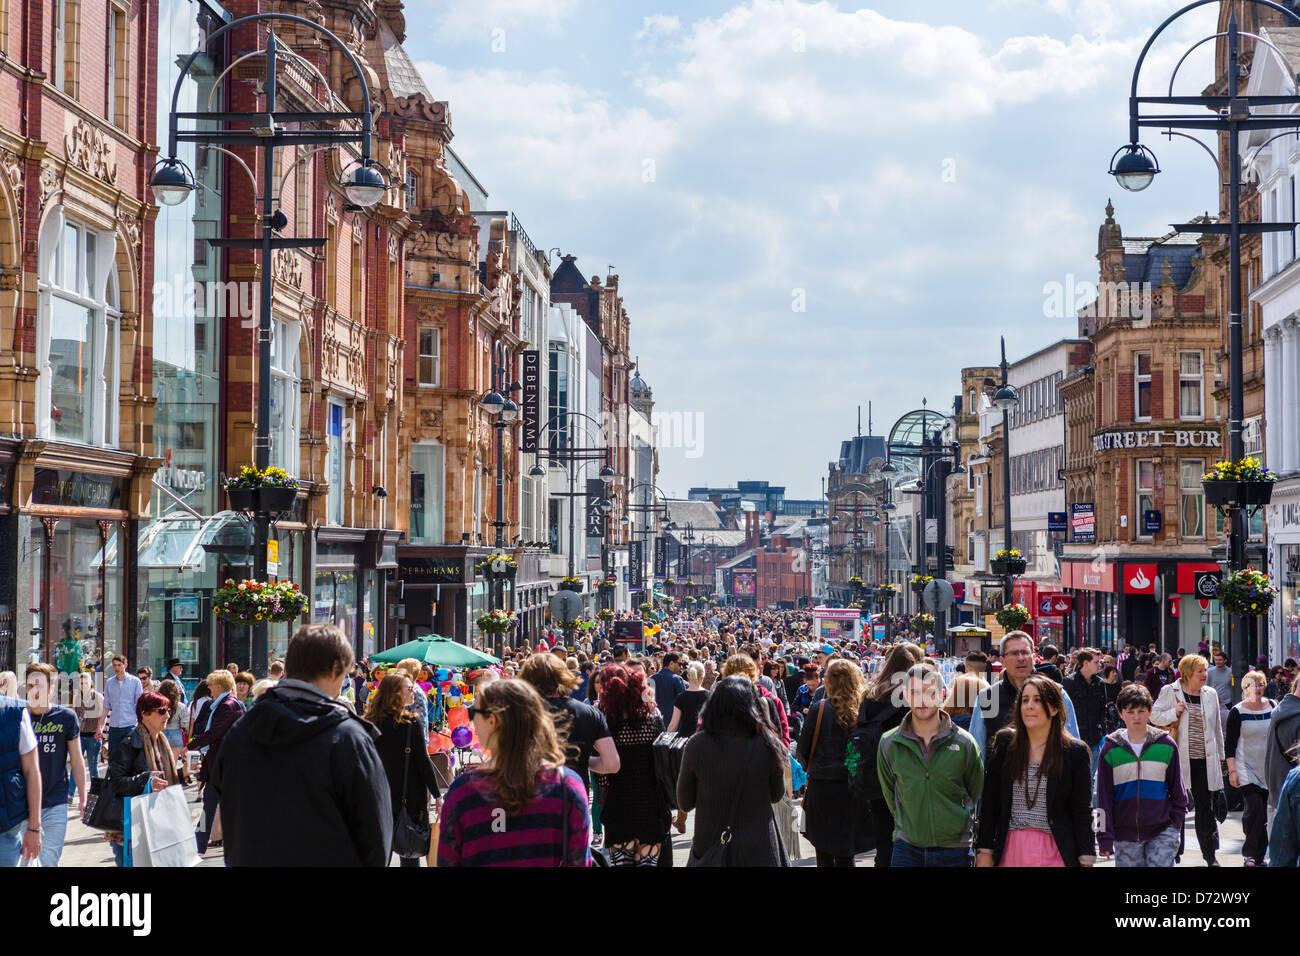 Crowded shopping street on a Saturday morning, Briggate, Leeds, West Yorkshire, UK - Stock Image